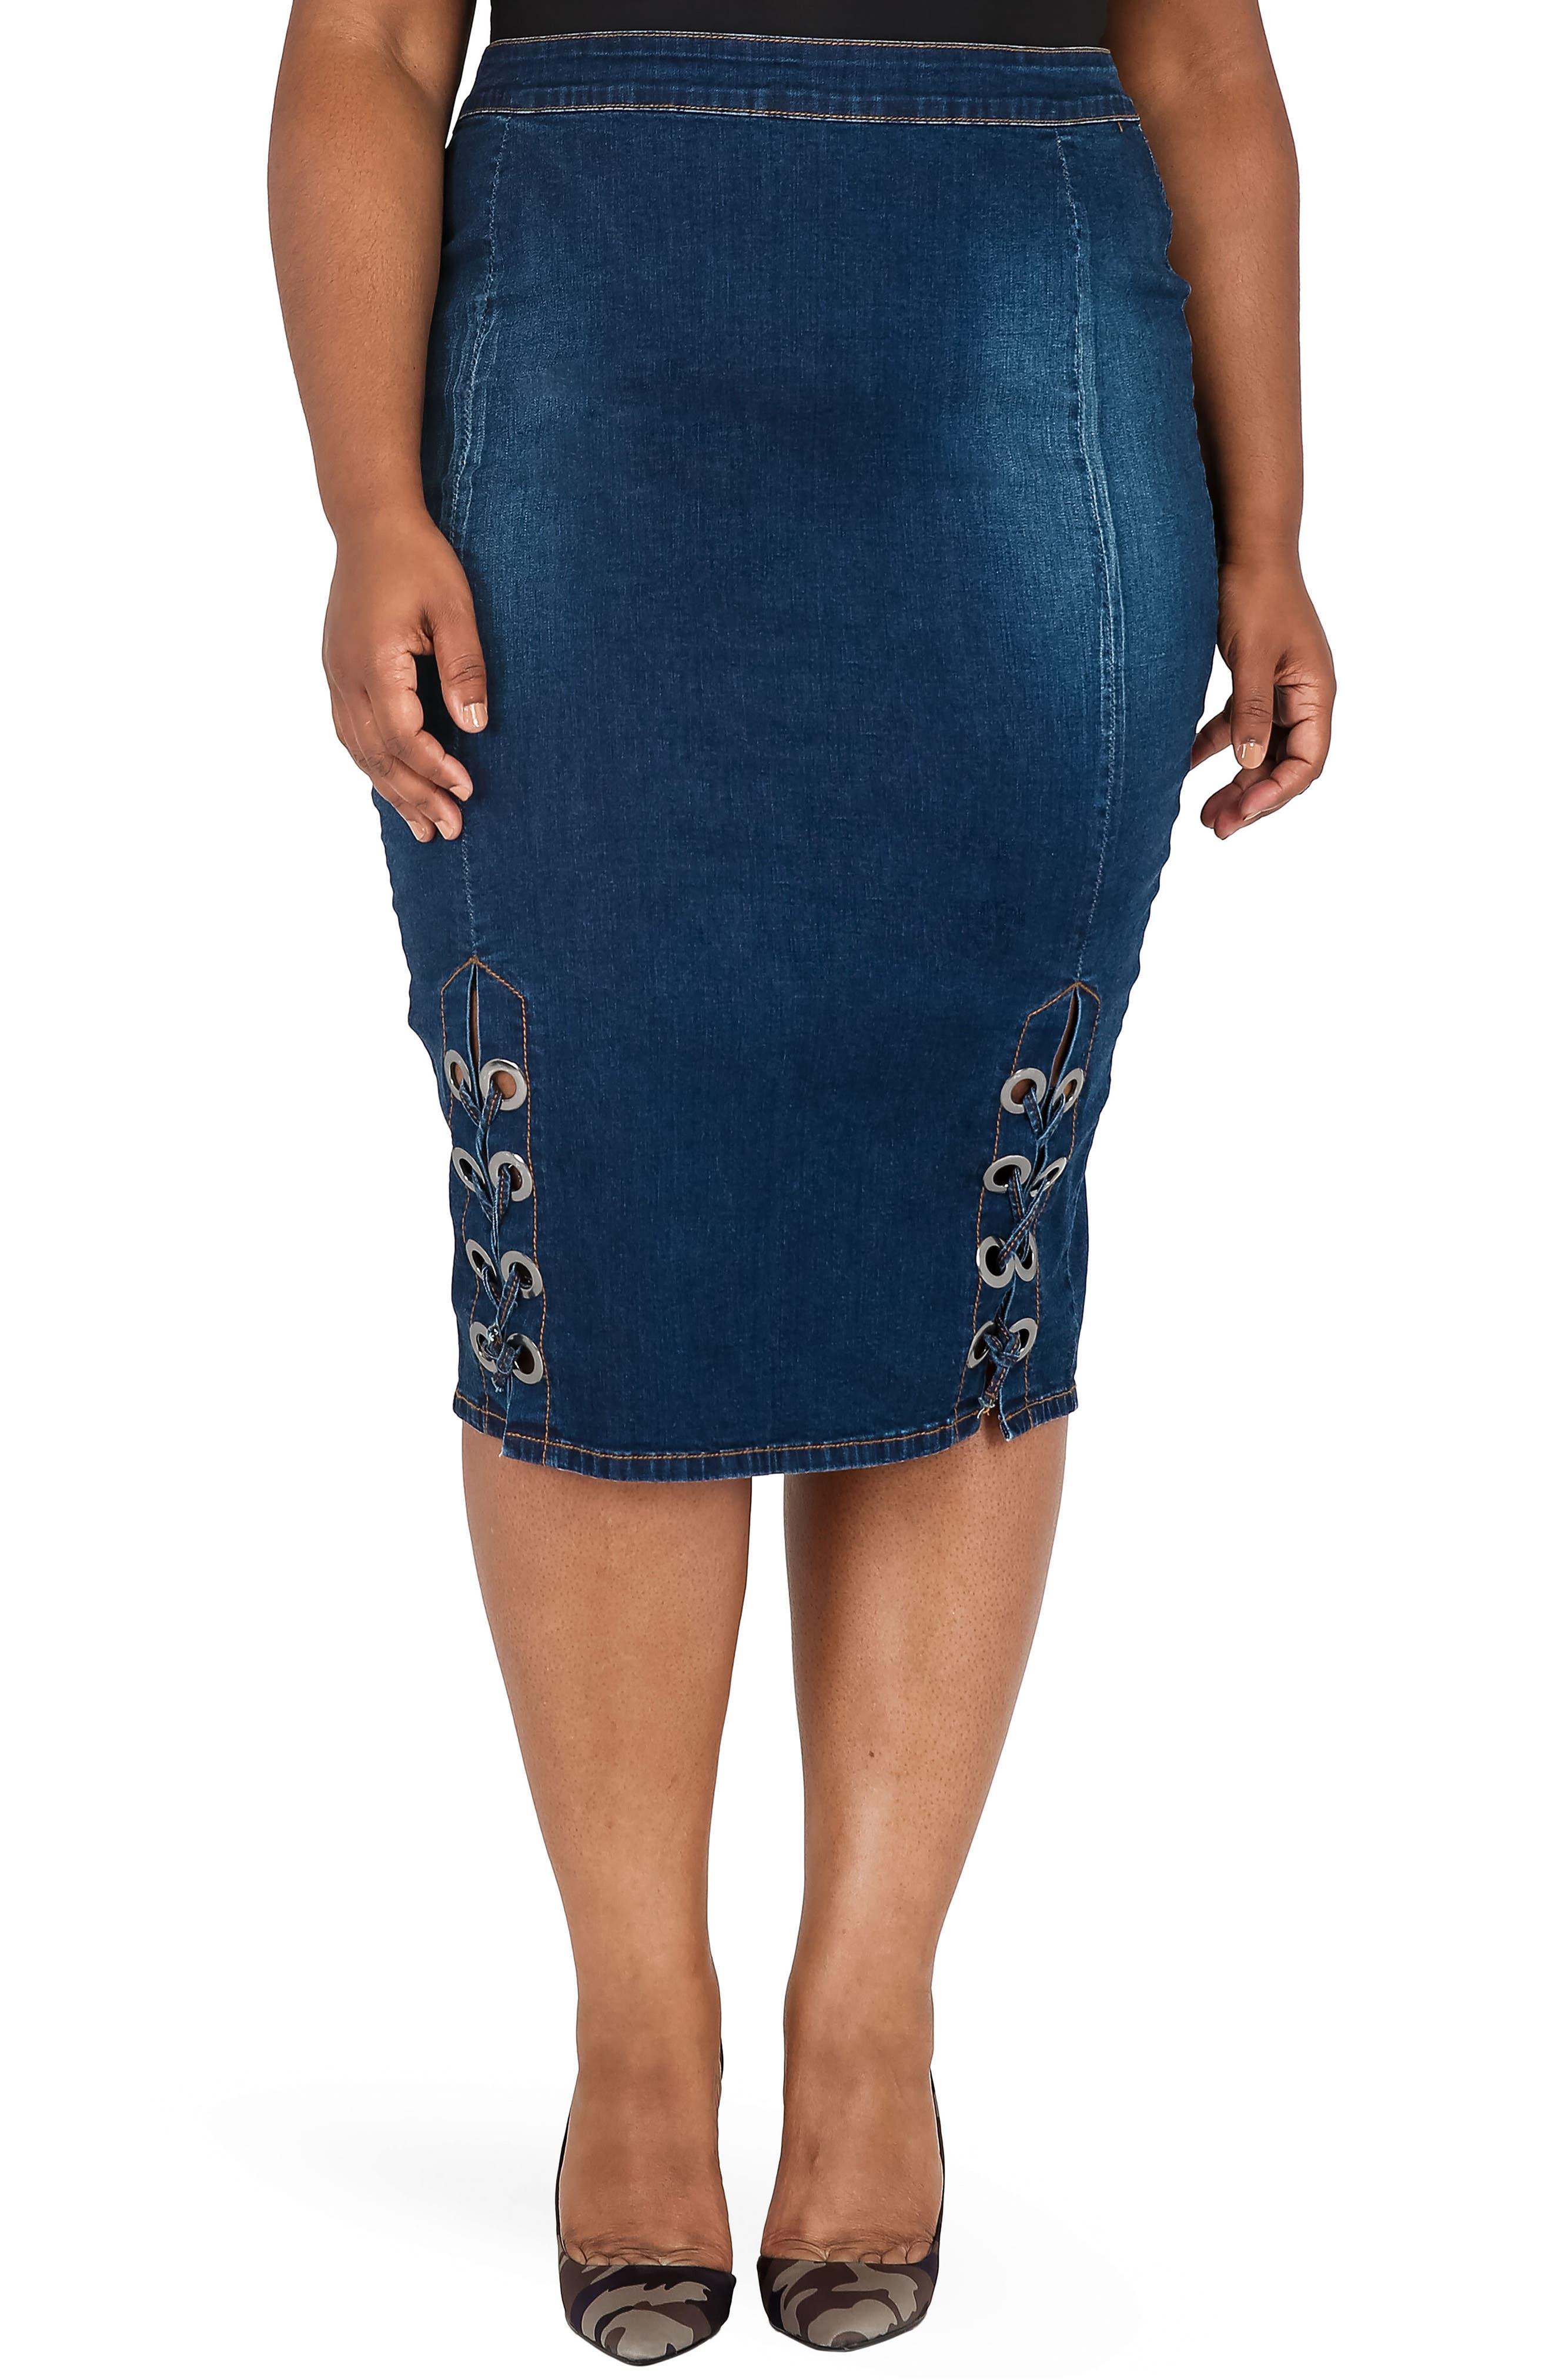 Plus Size Poetic Justice Eula Denim Skirt, Blue